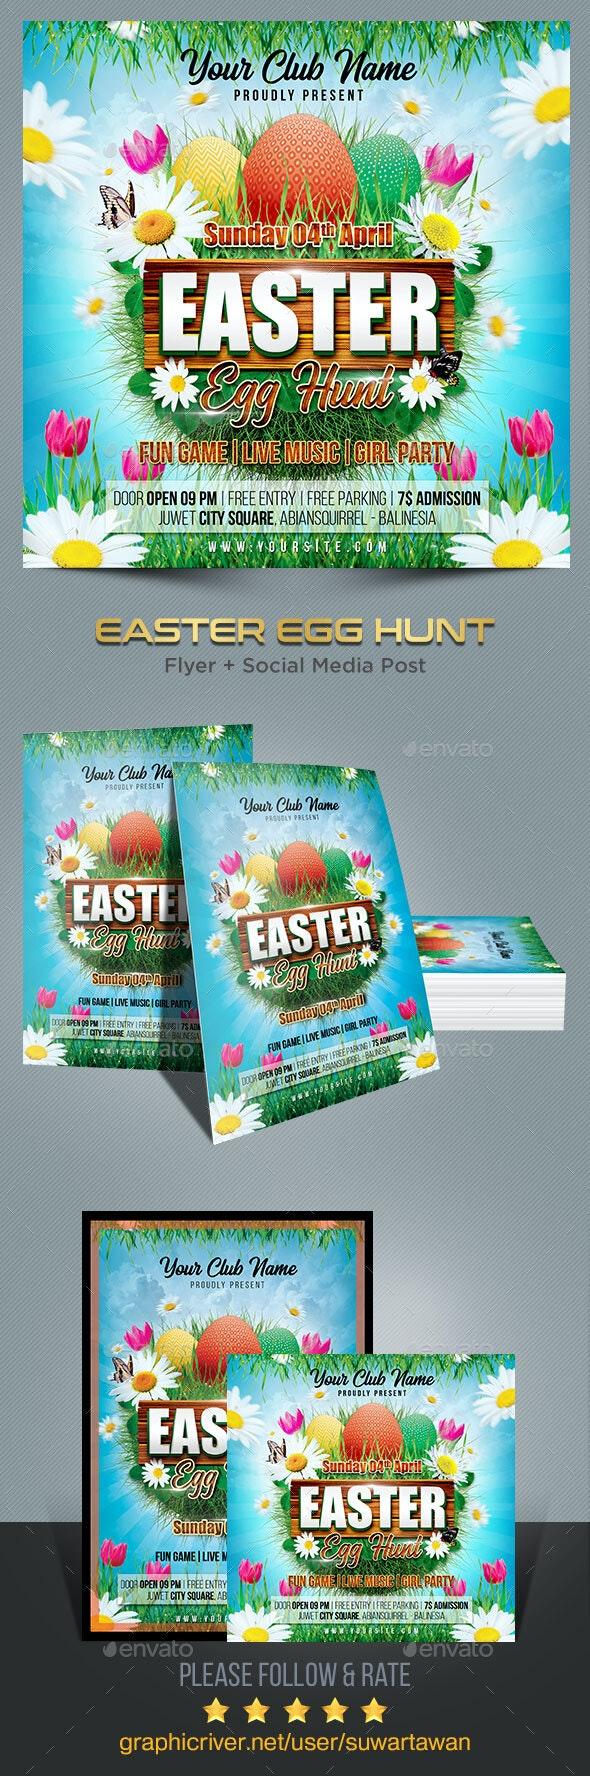 Easter Egg Hunt Flyer Template - Print Templates